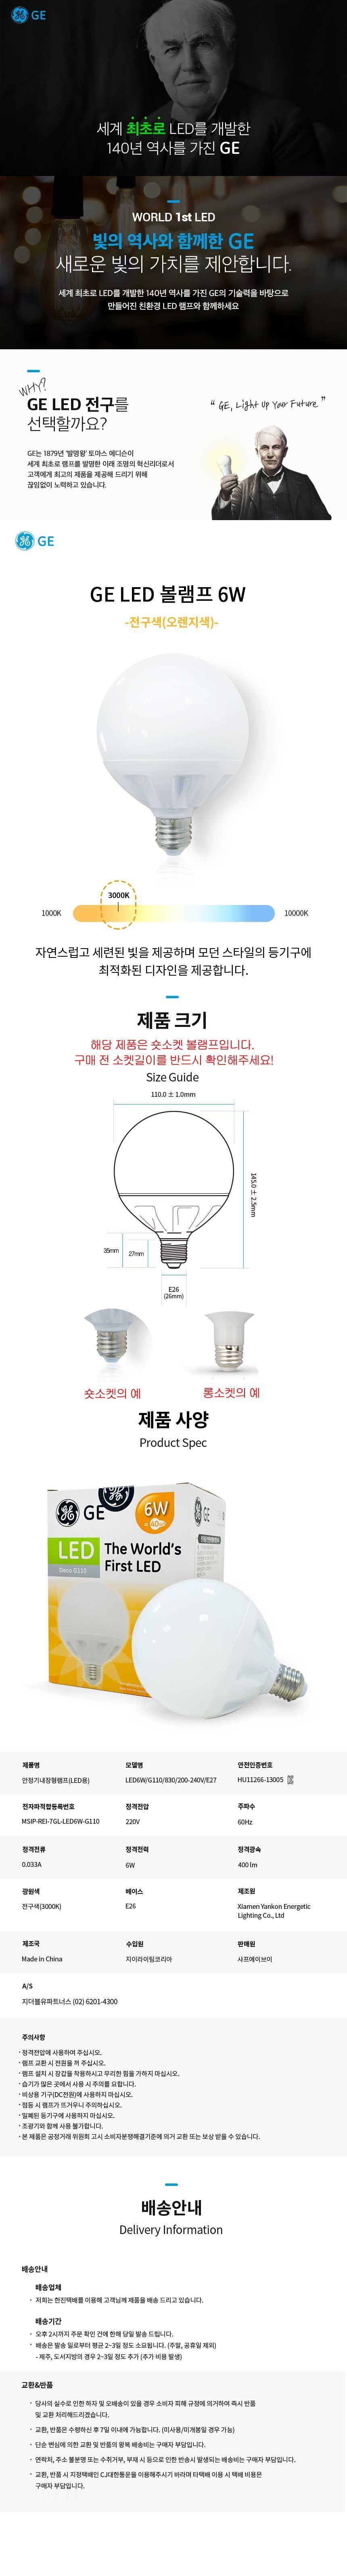 GE_bowllamp_6W_orange_verdor.jpg